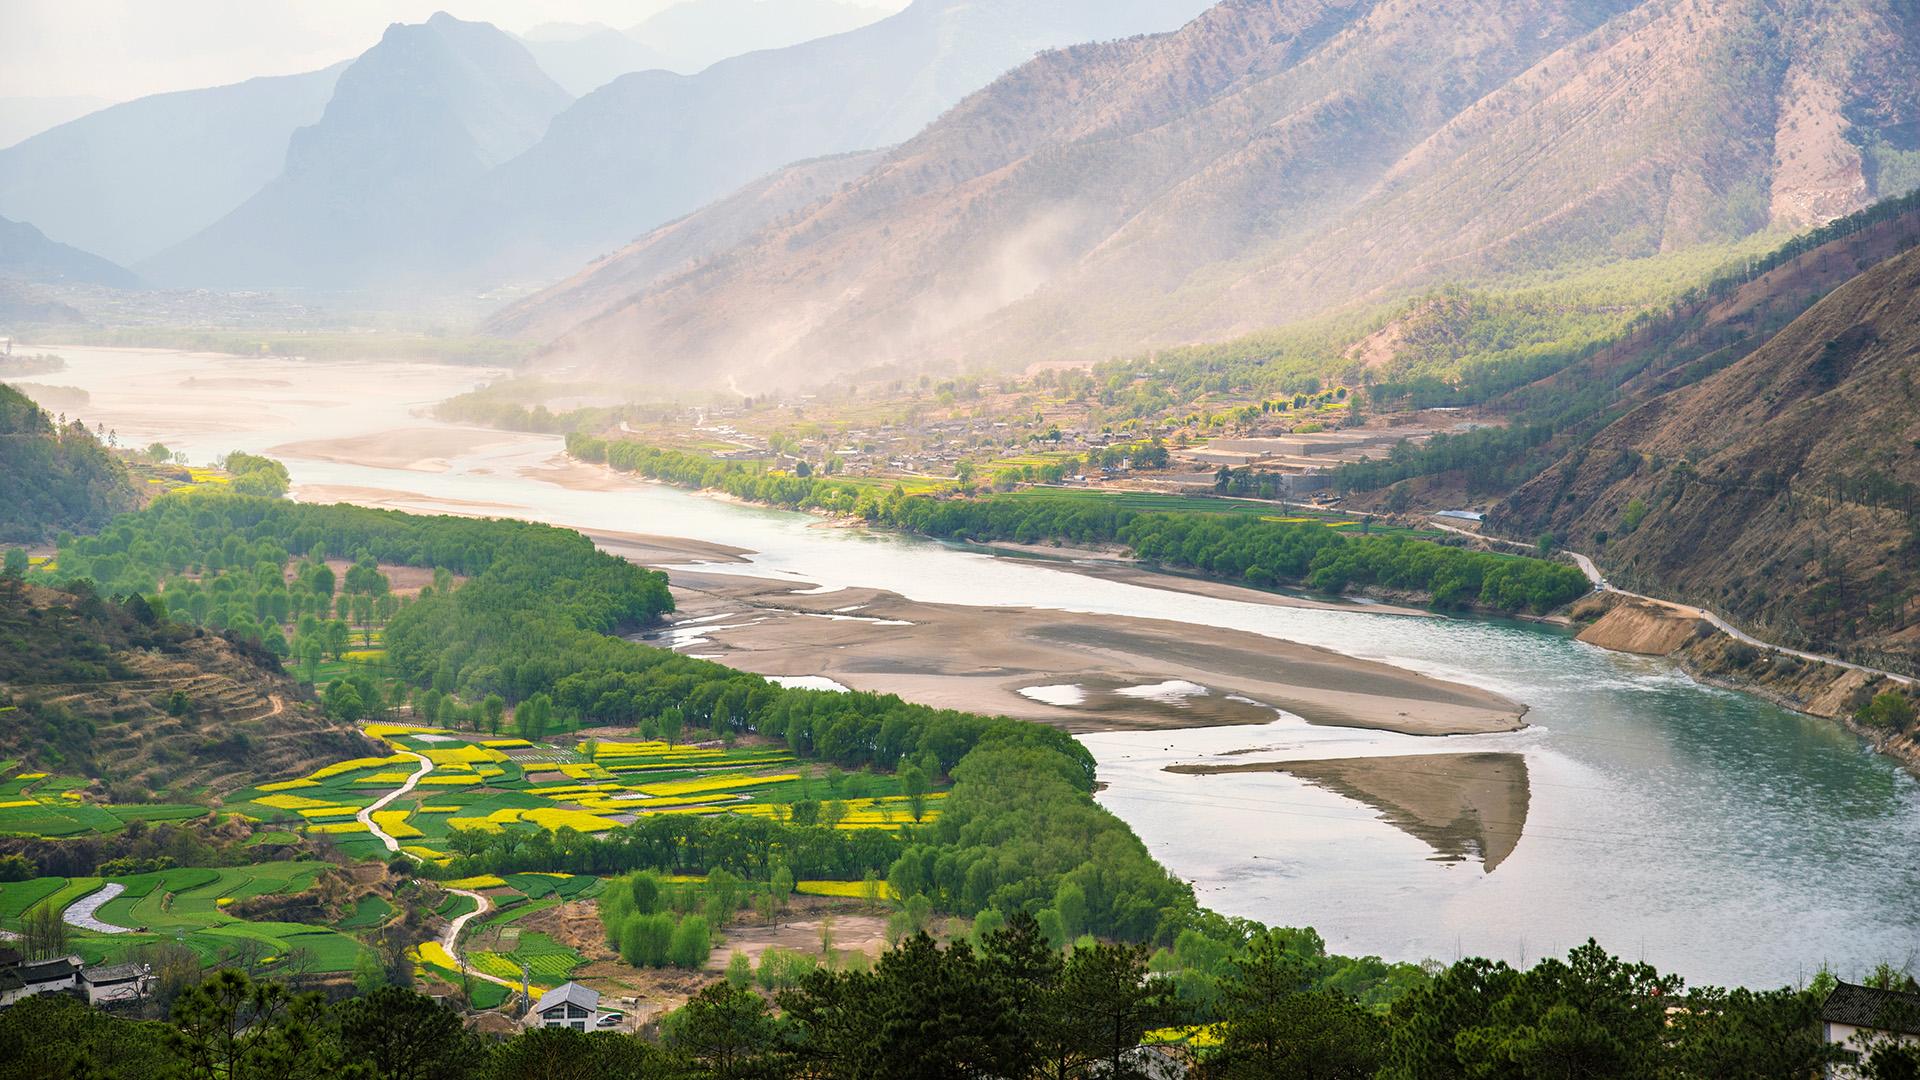 Heimat der Störe: Der Jangtse-Fluss, der größte Fluss Asiens. © martinhosmart / iStock / Getty Images Plus